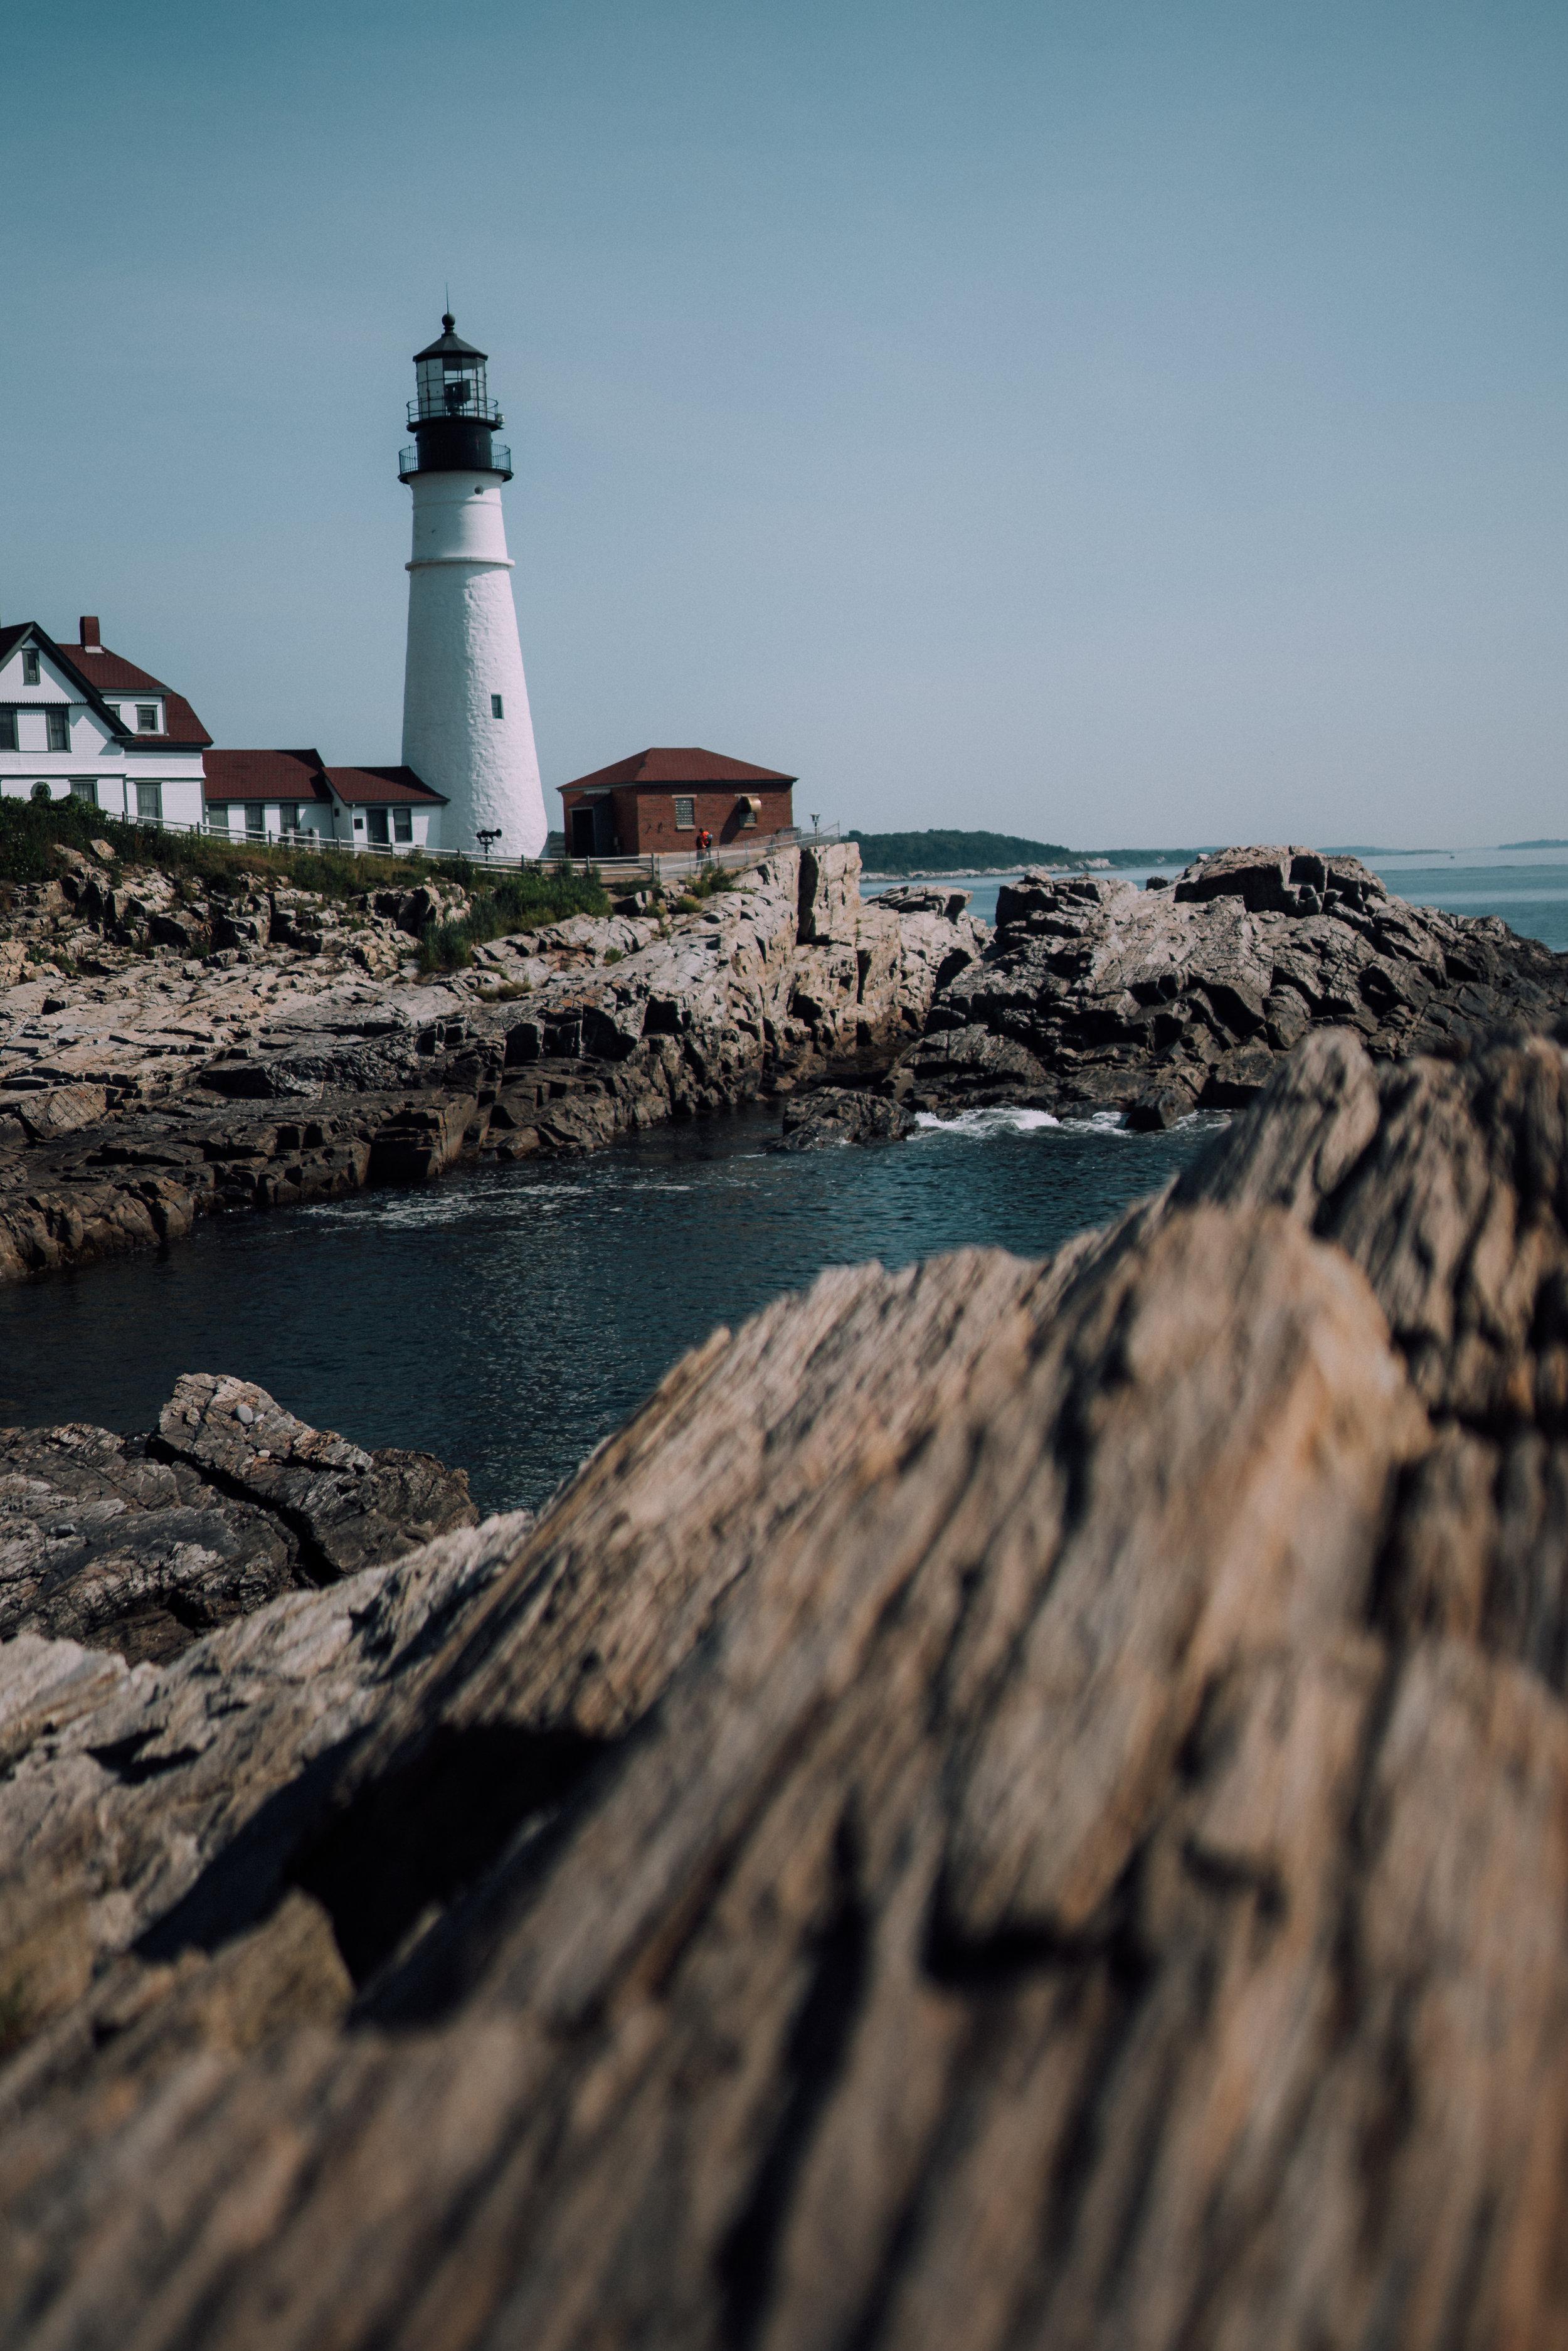 Hafer_711619_Lighthouse_portland-00899.jpg